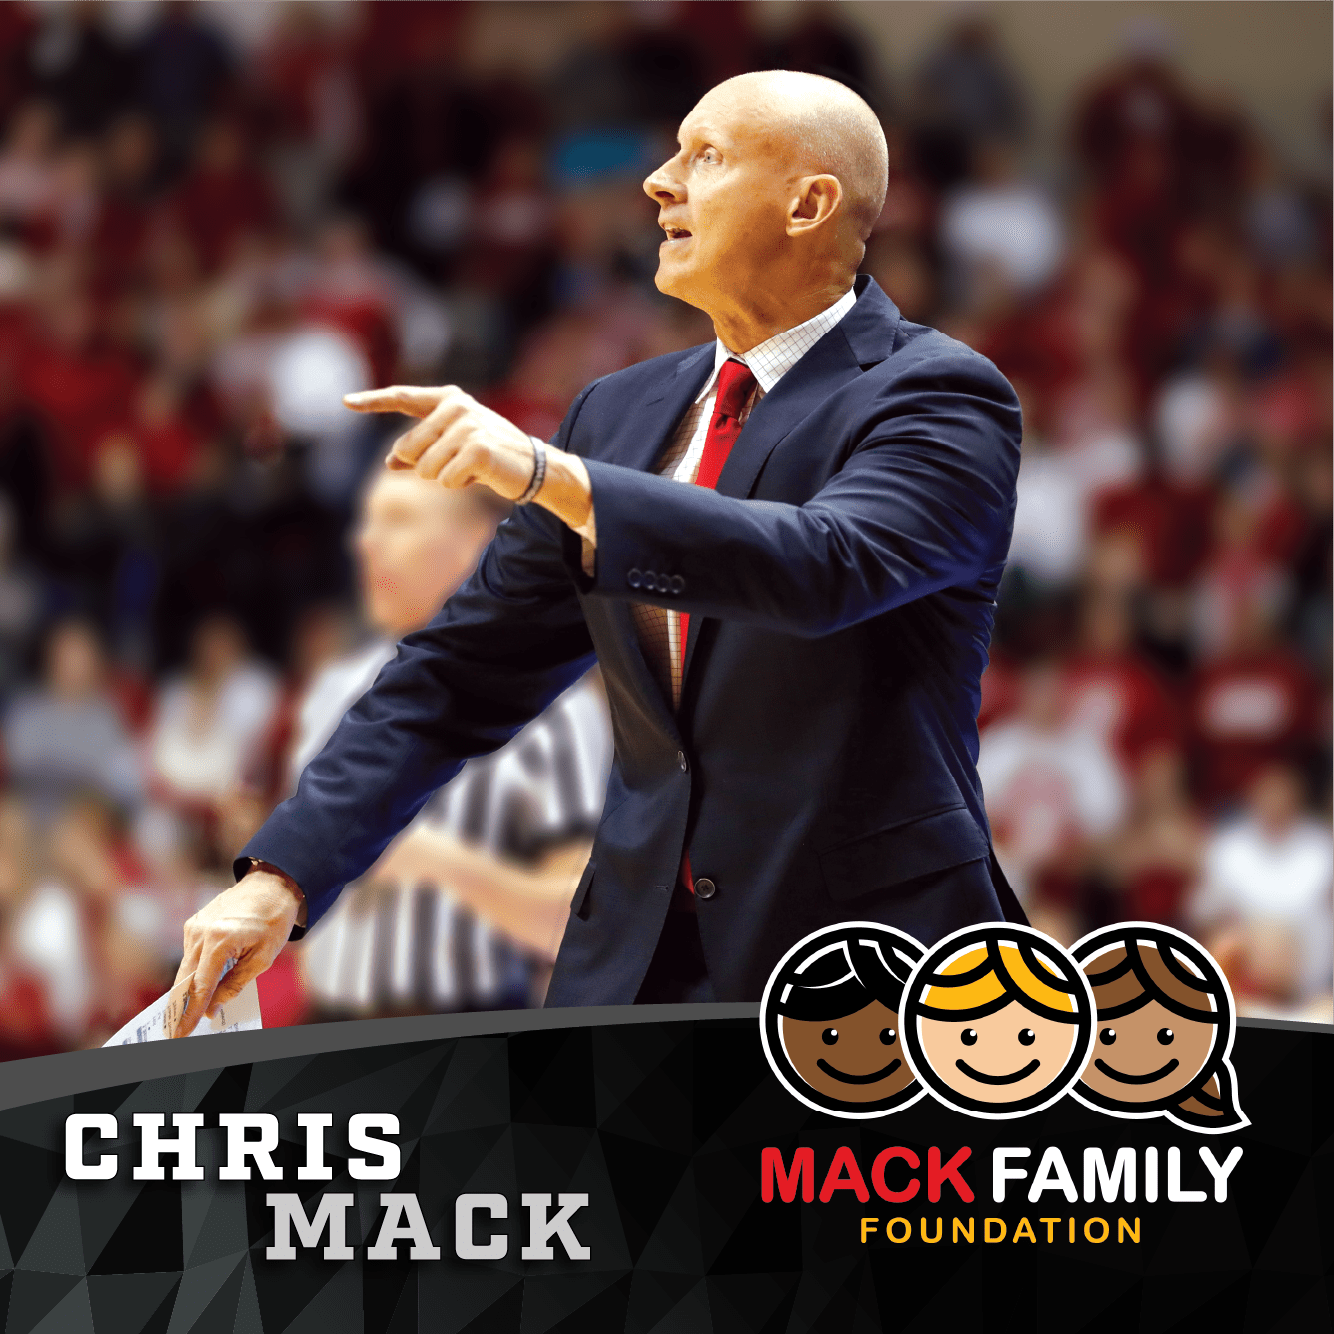 Chris Mack